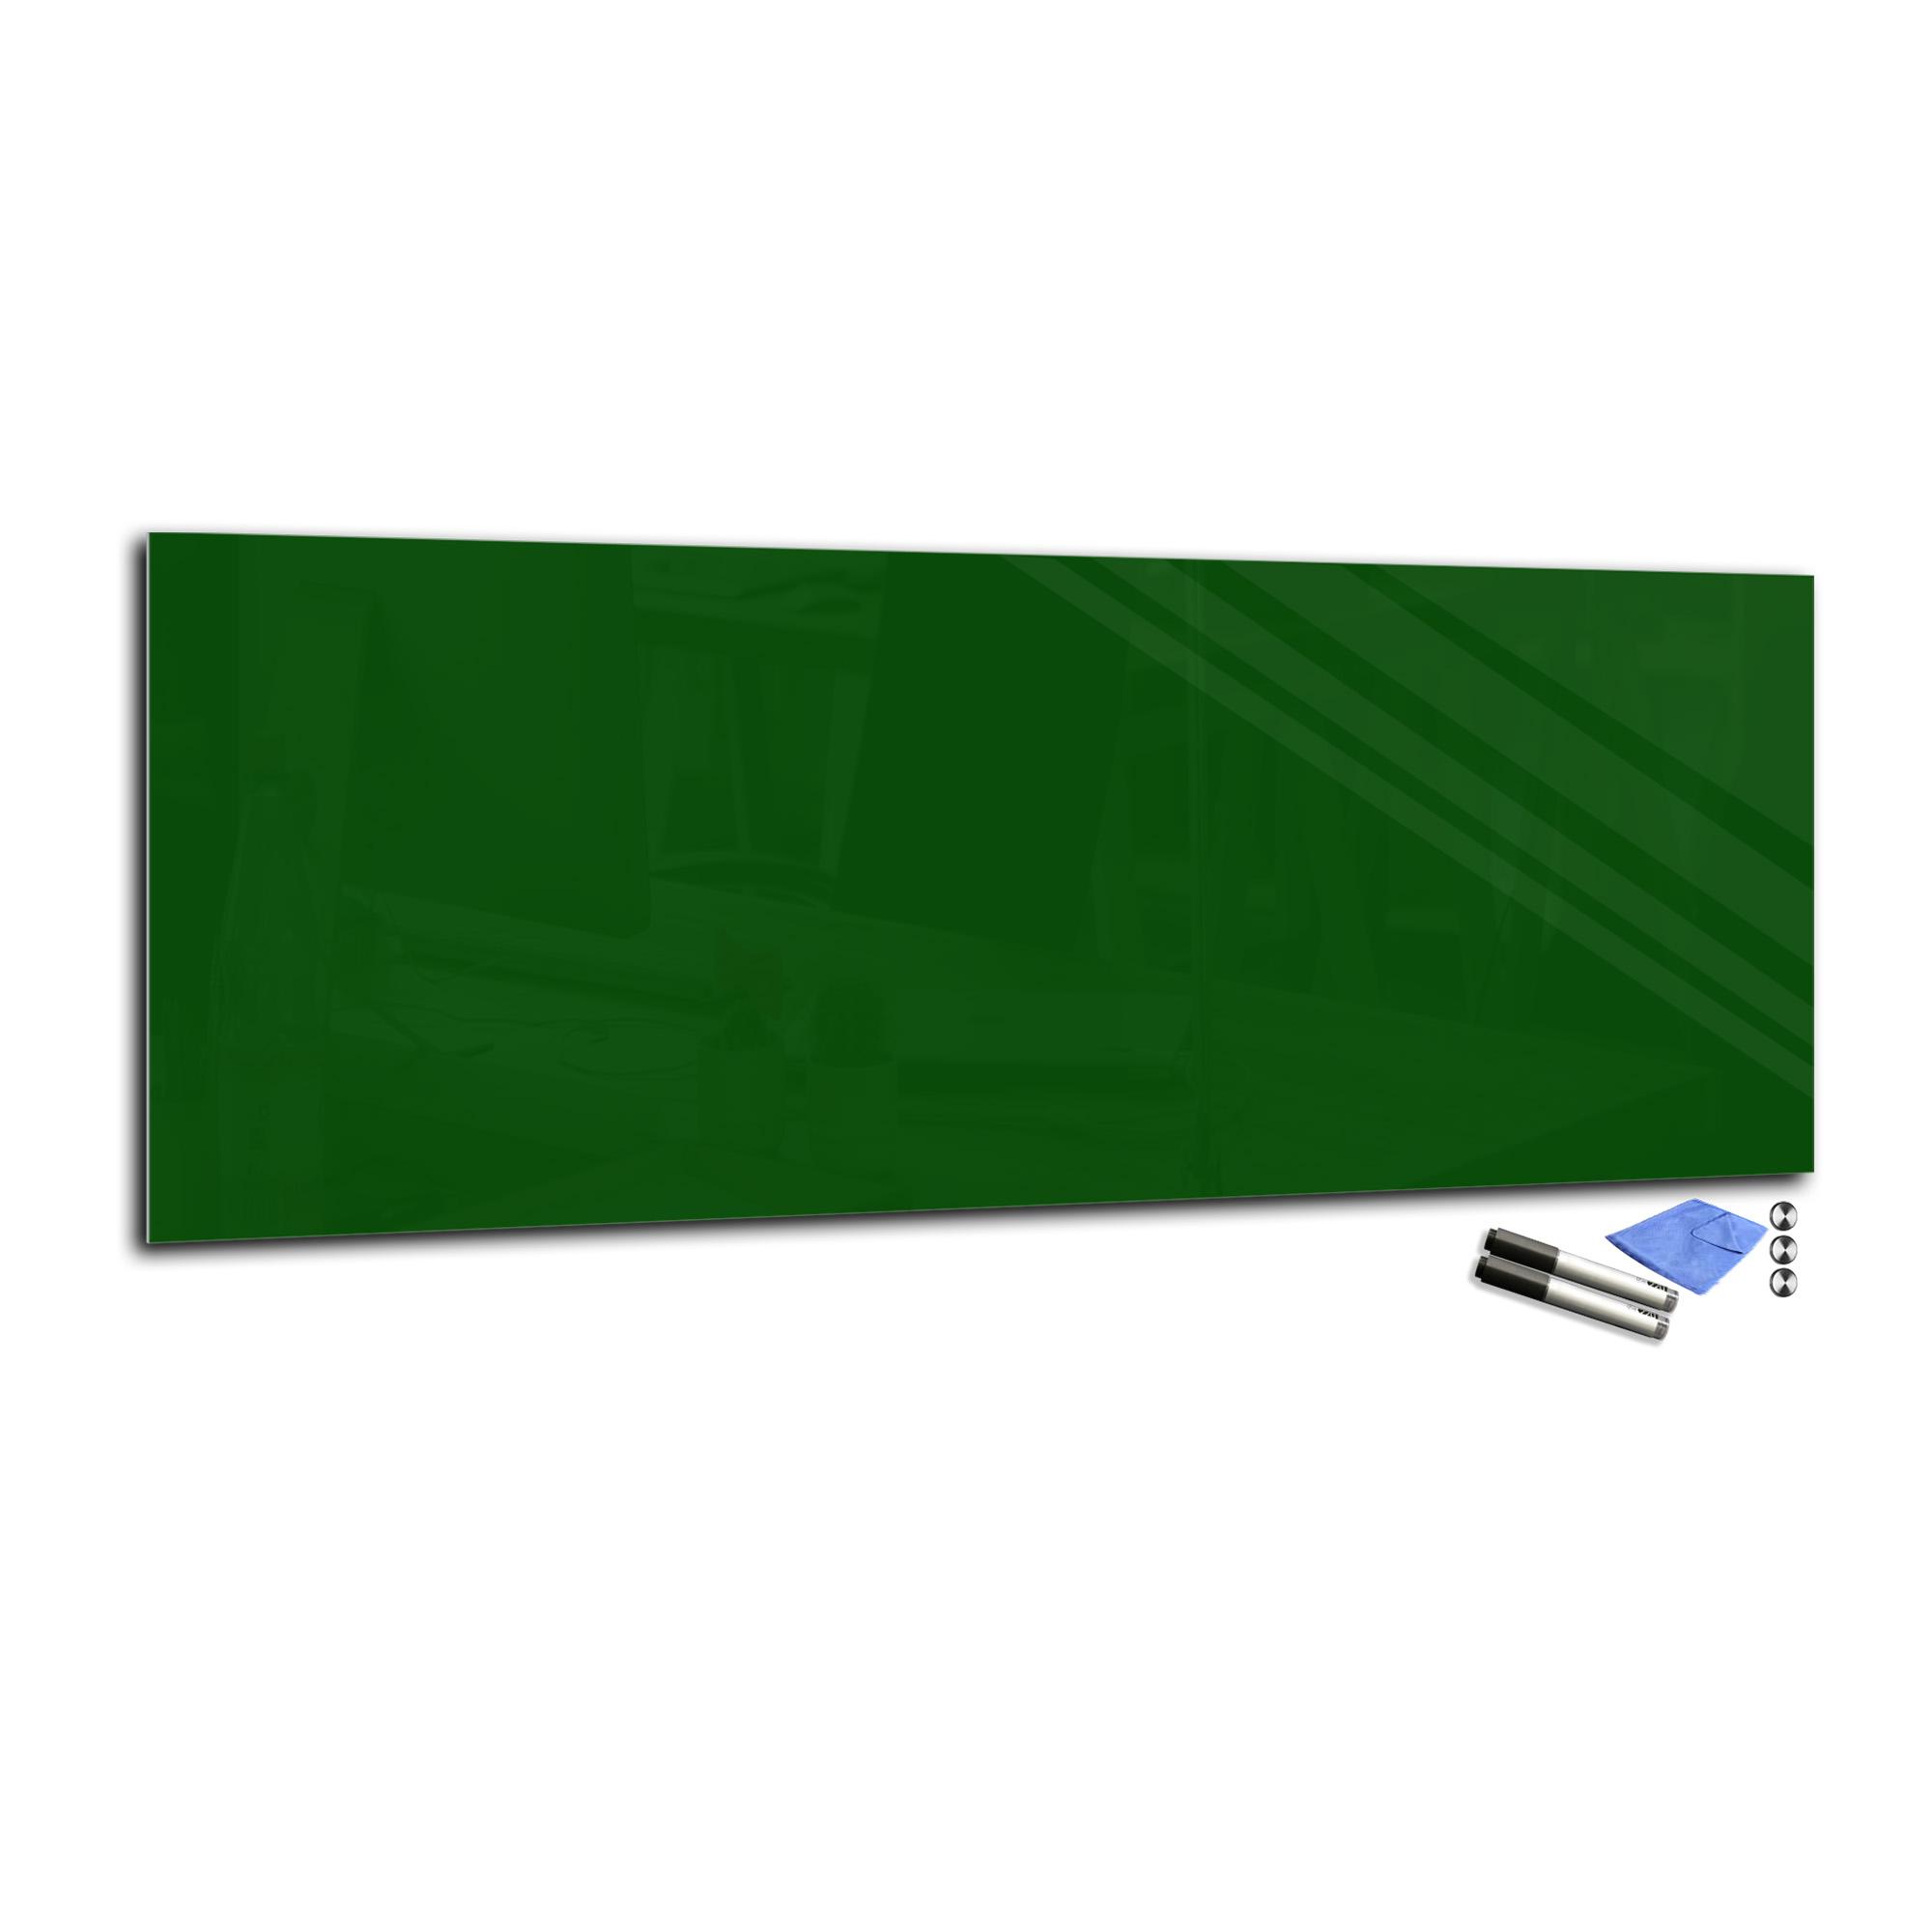 Magnetic Glas Board Temperot Glas Markerboard T01 40x100cm dark Grün